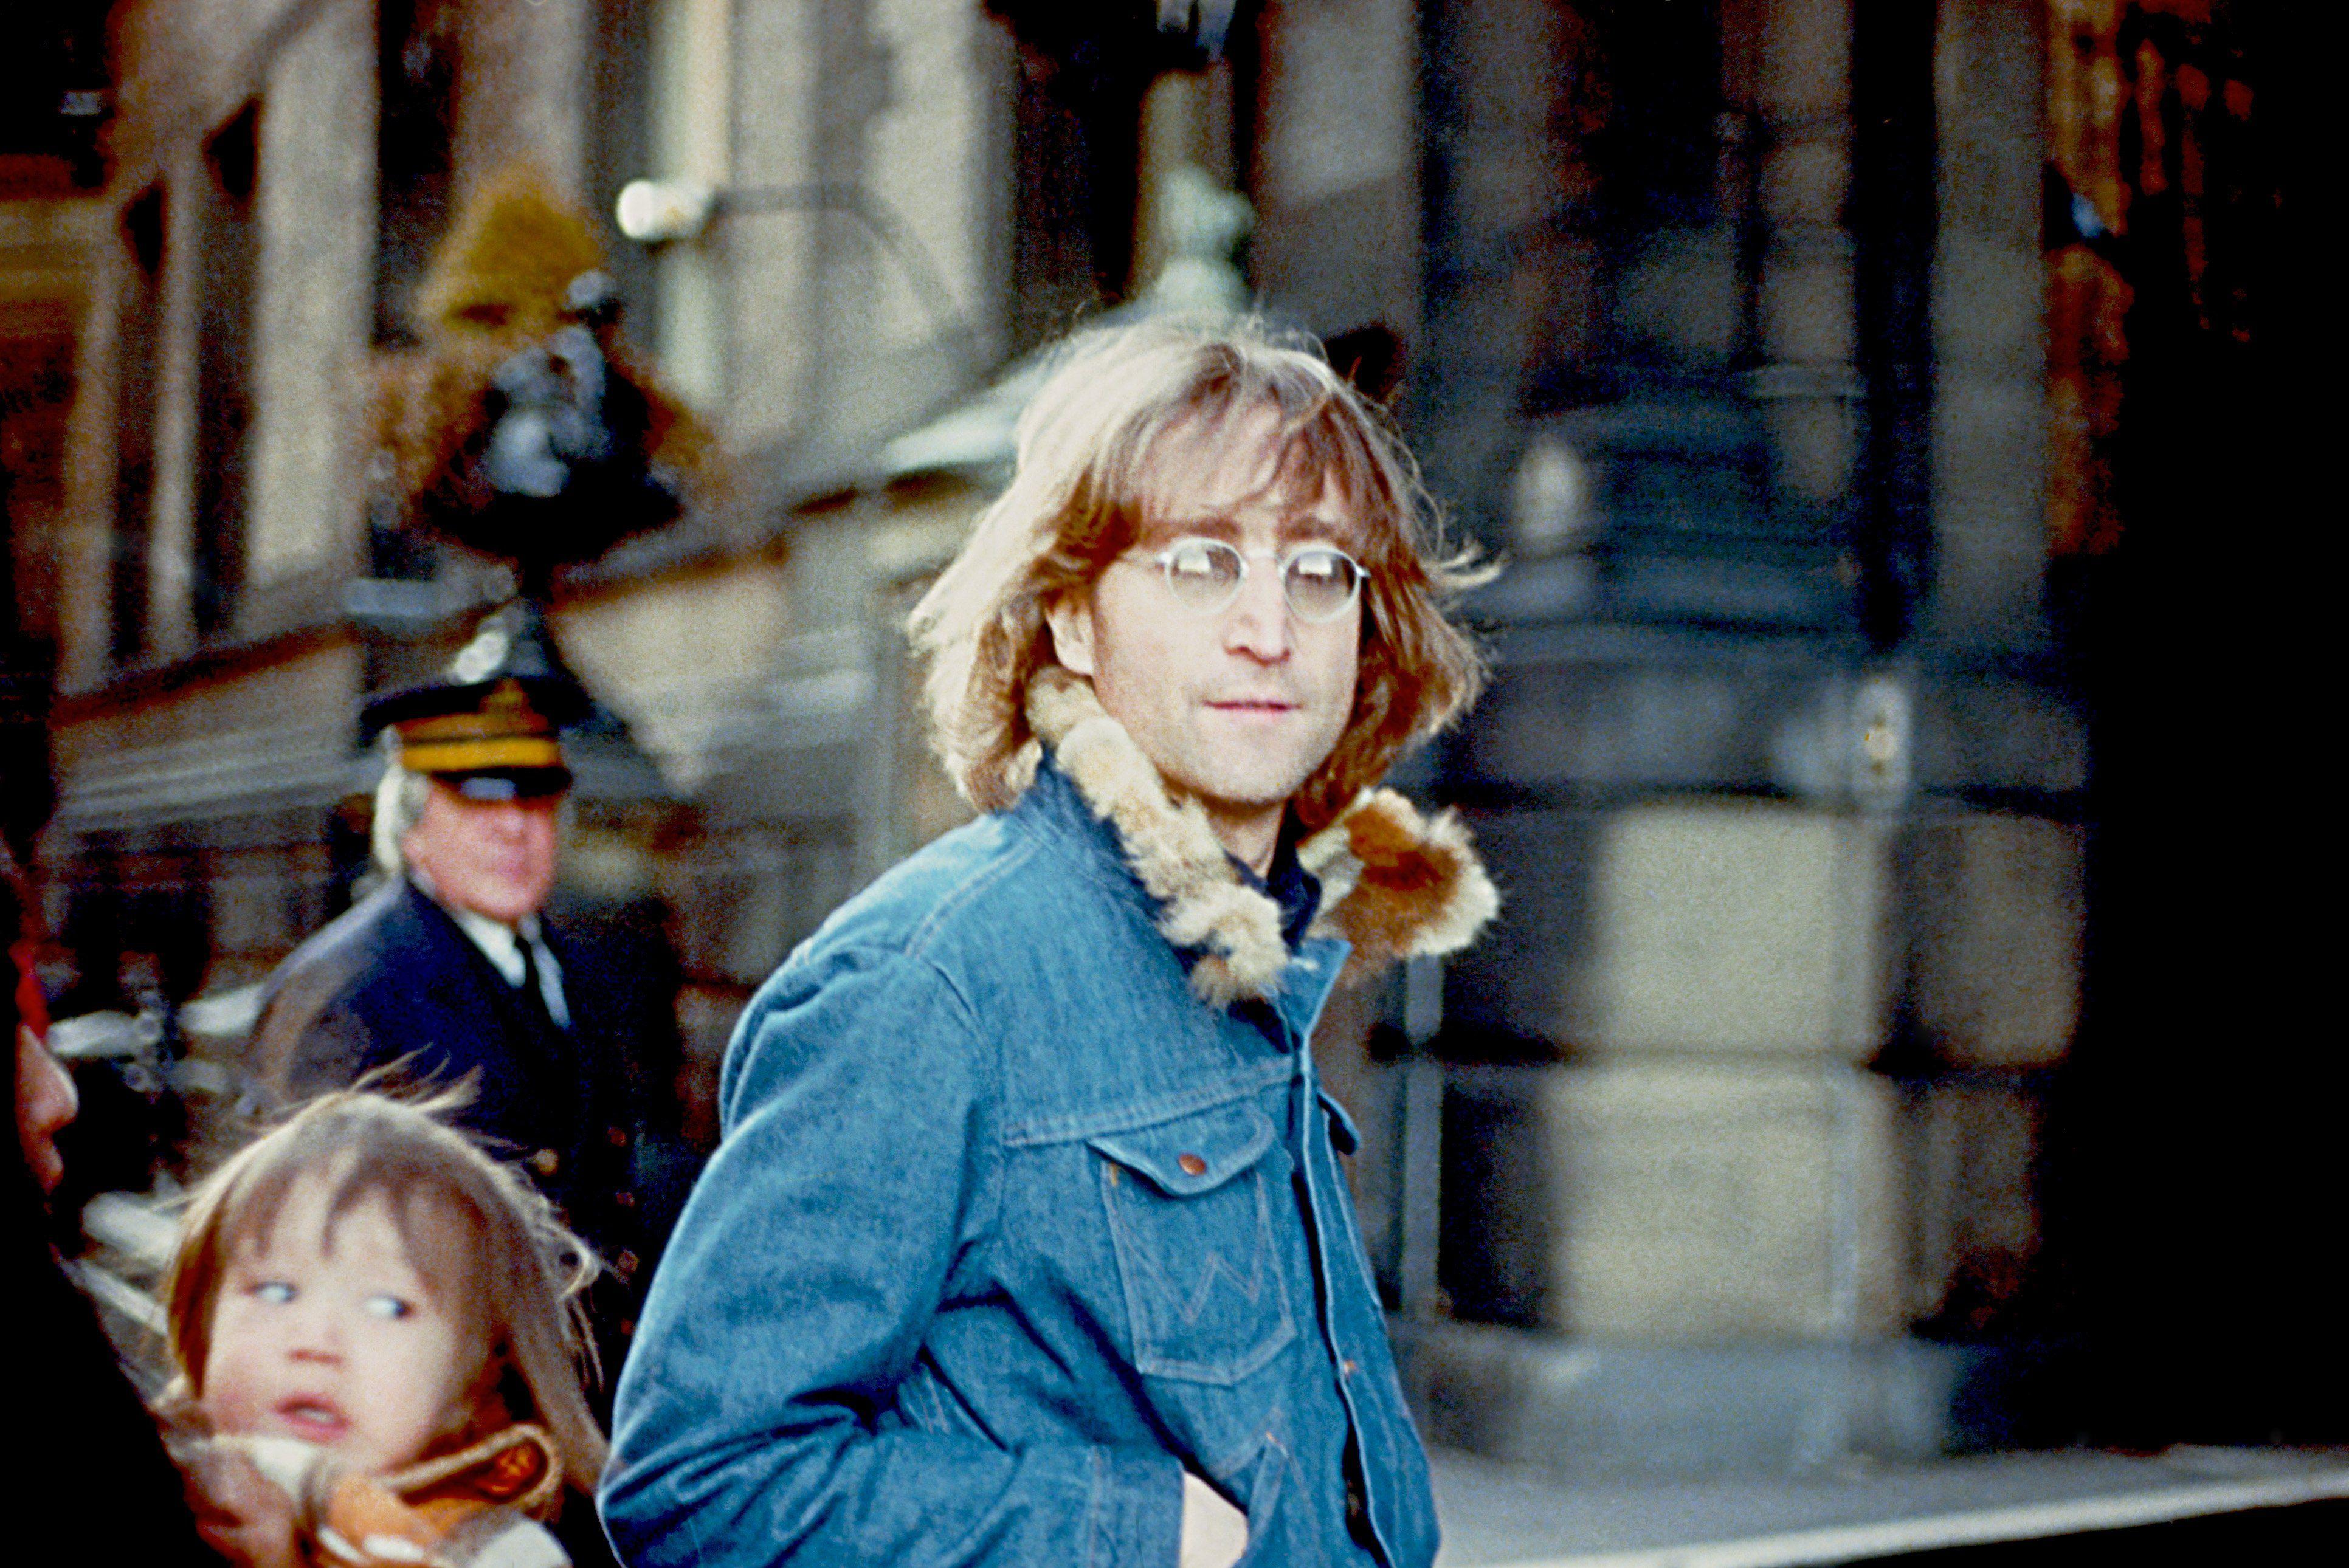 John Lennon looking at camera, full color photograph.